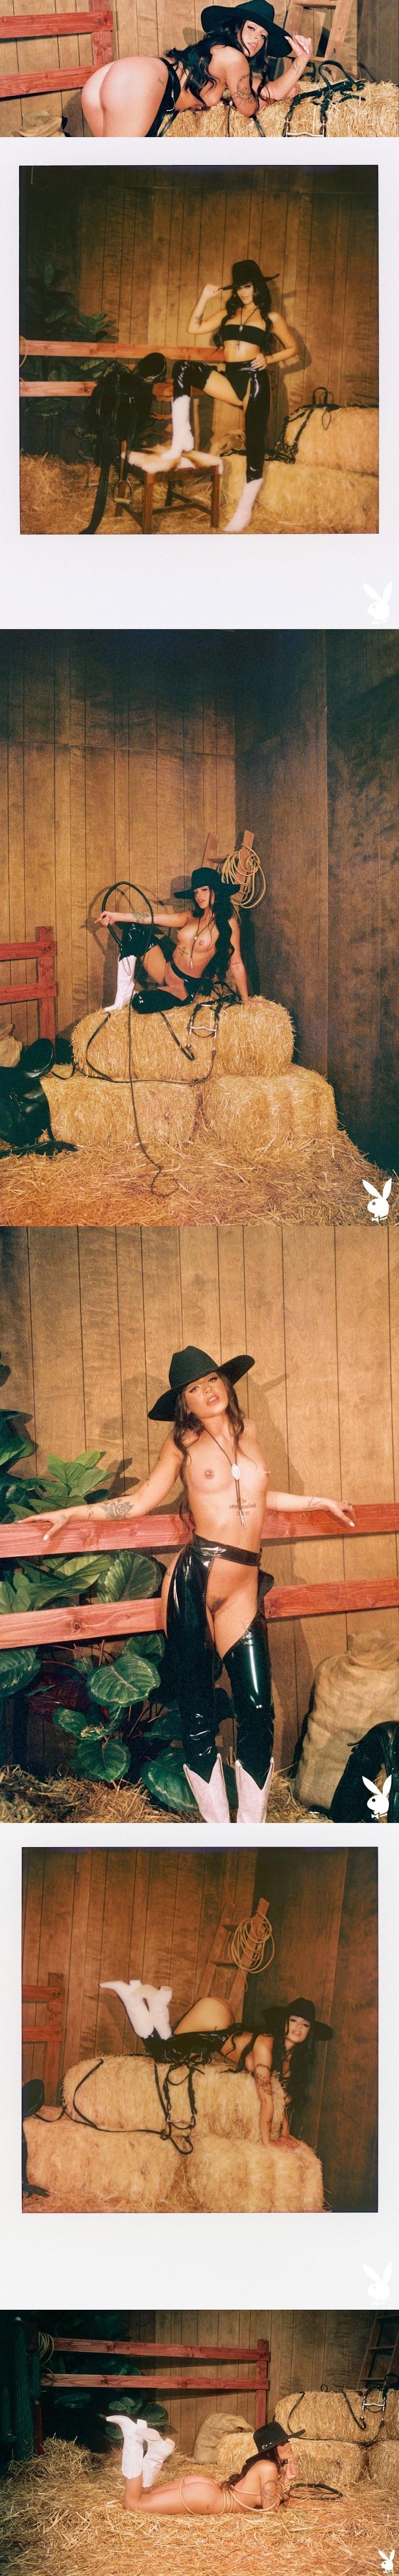 [Playboy Plus] Ryan Reid in Back in the Saddle sexy girls image jav